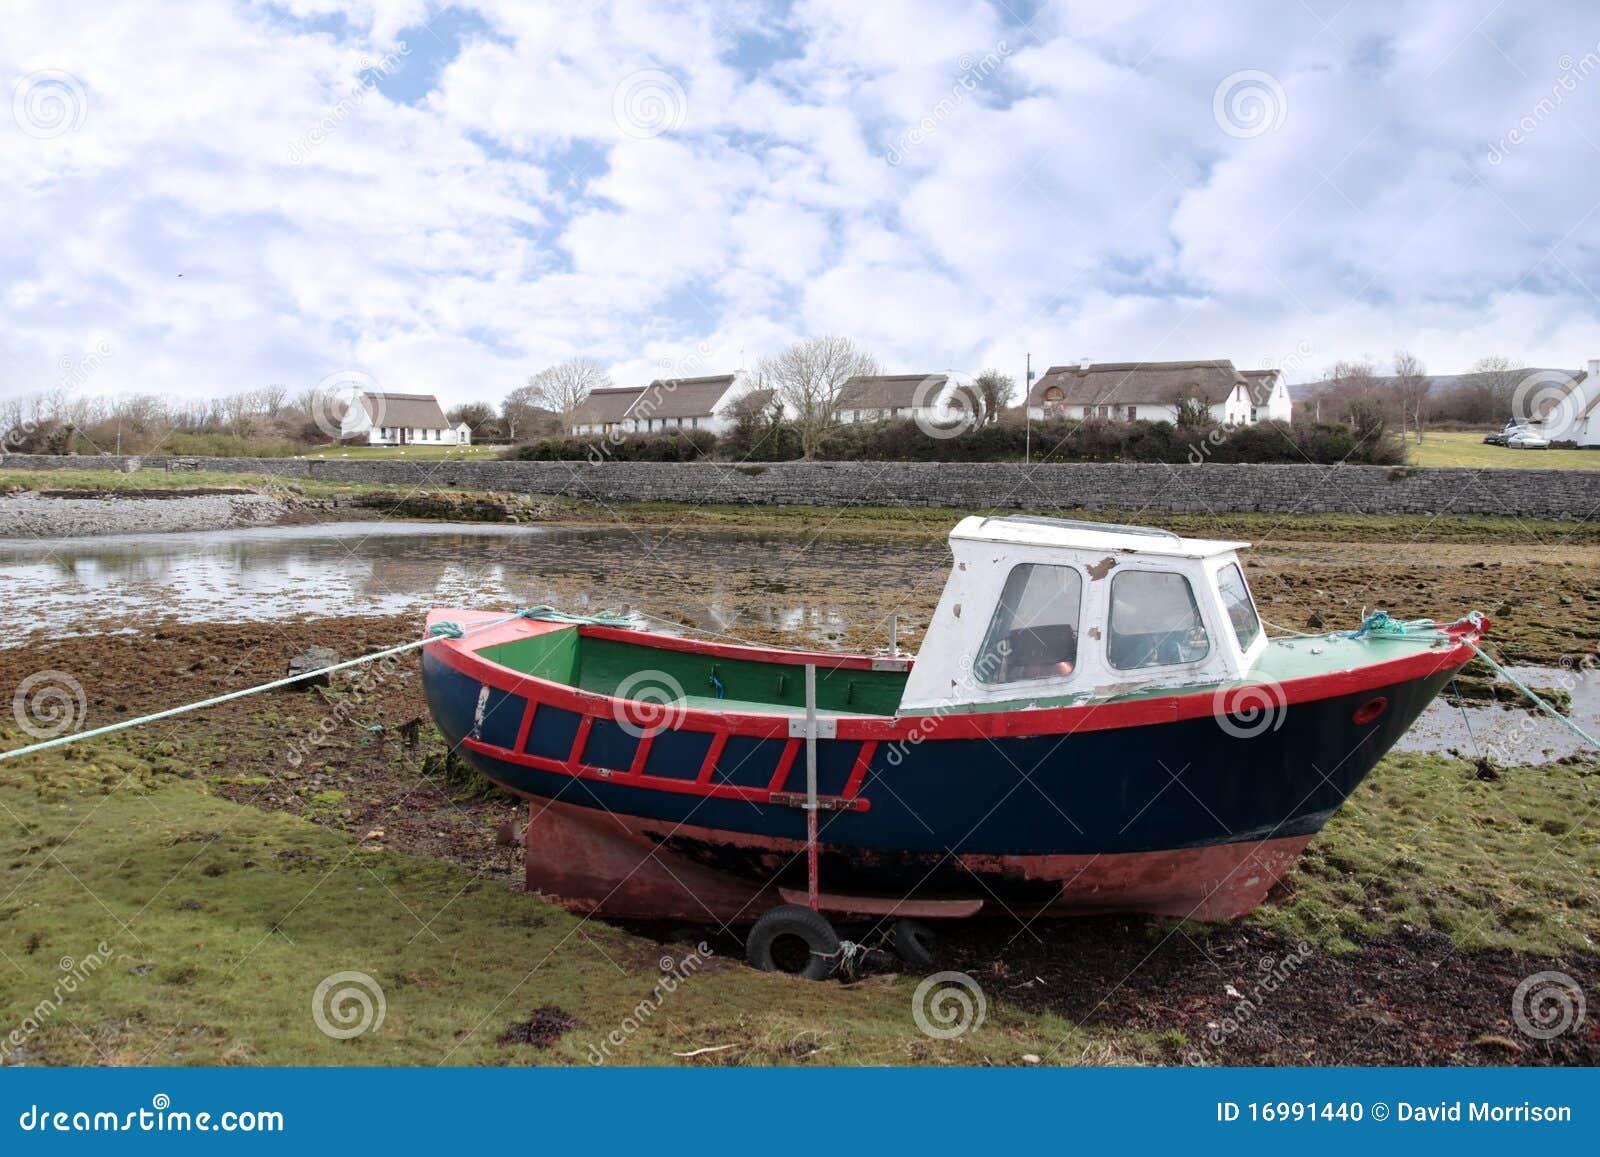 Old Fishing Boat Moored Stock Photo - Image: 16991440